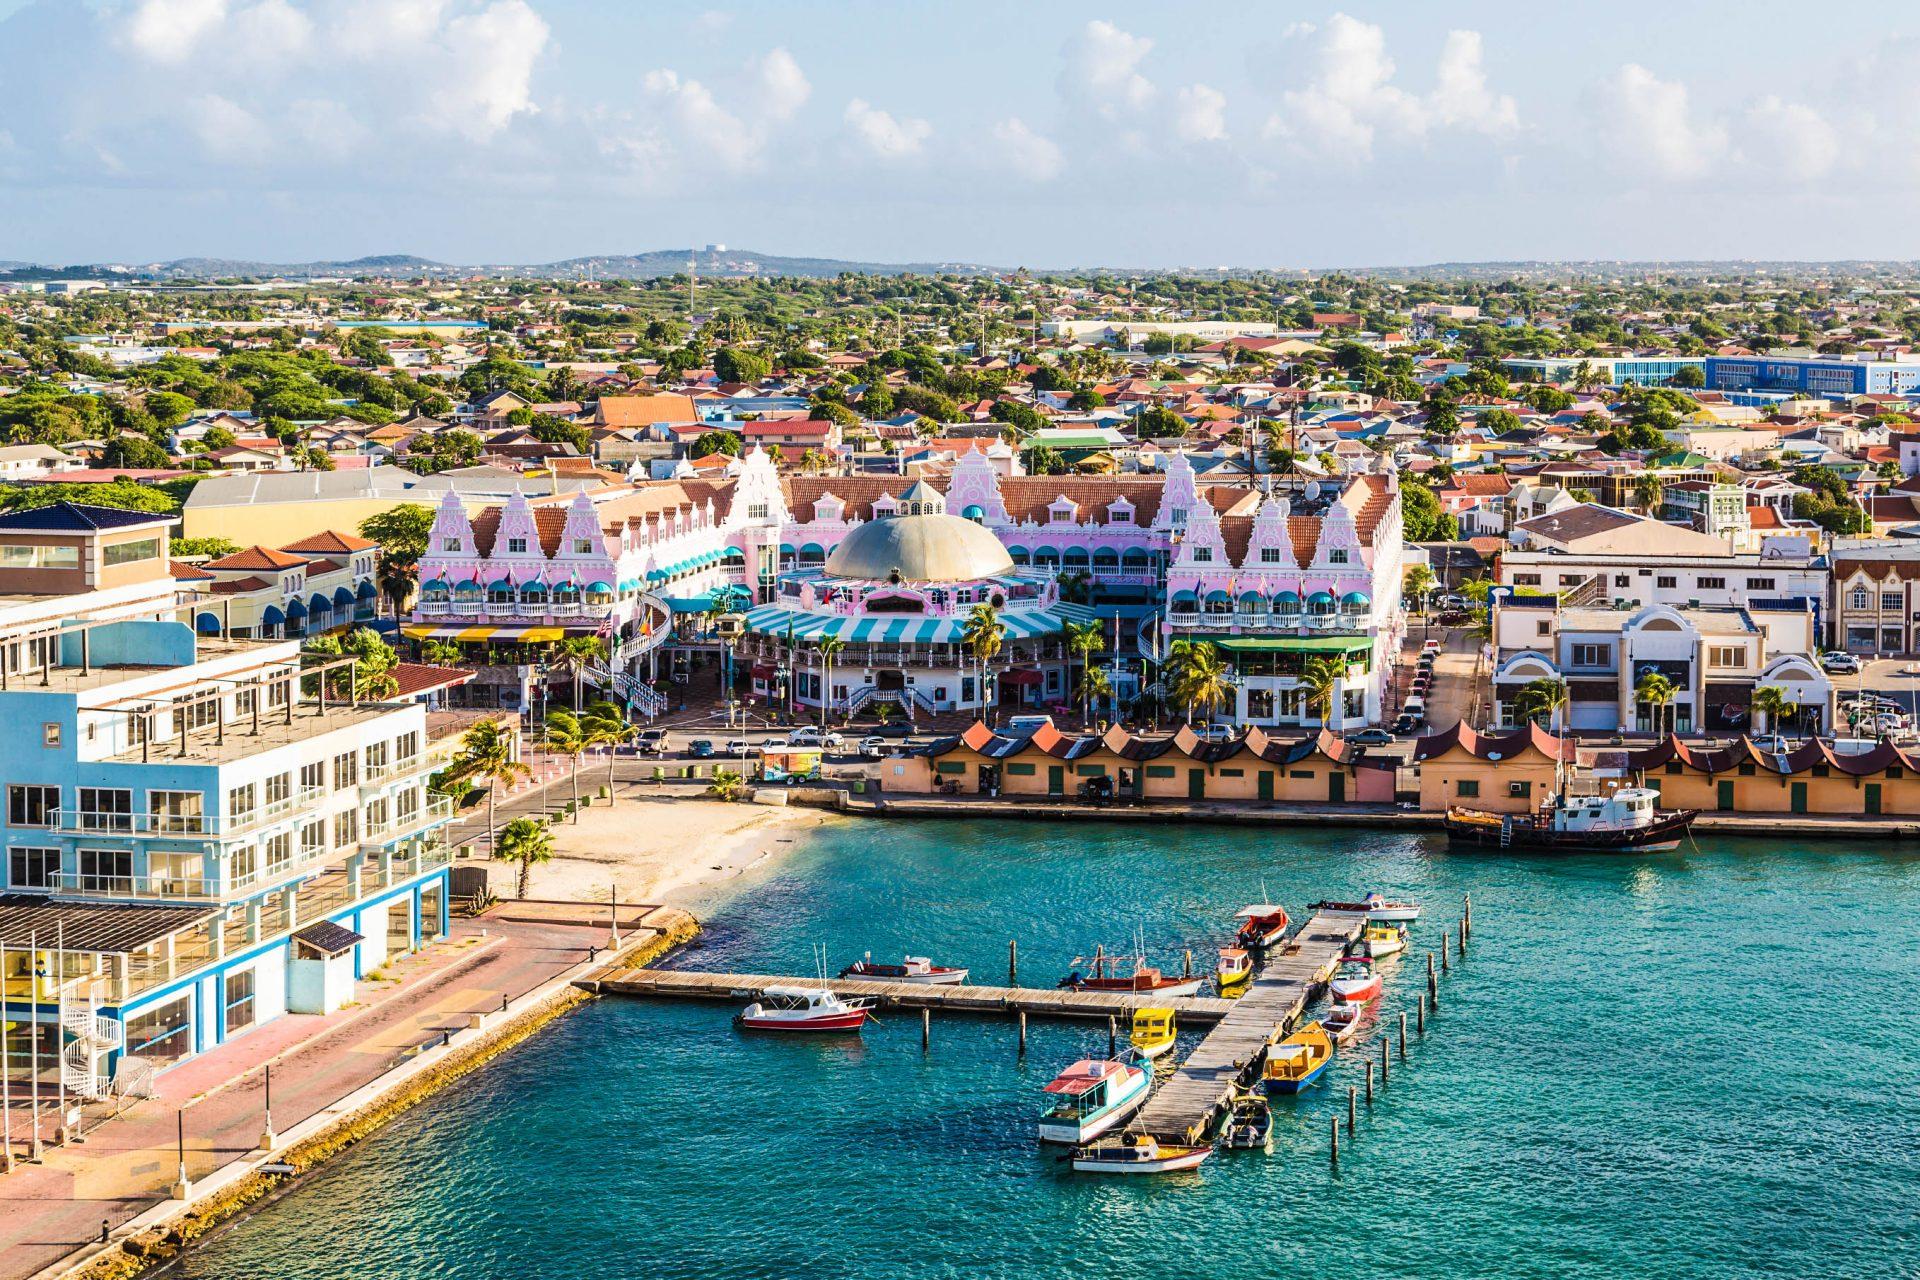 Aruber Bunter Hafen in Oranjestad